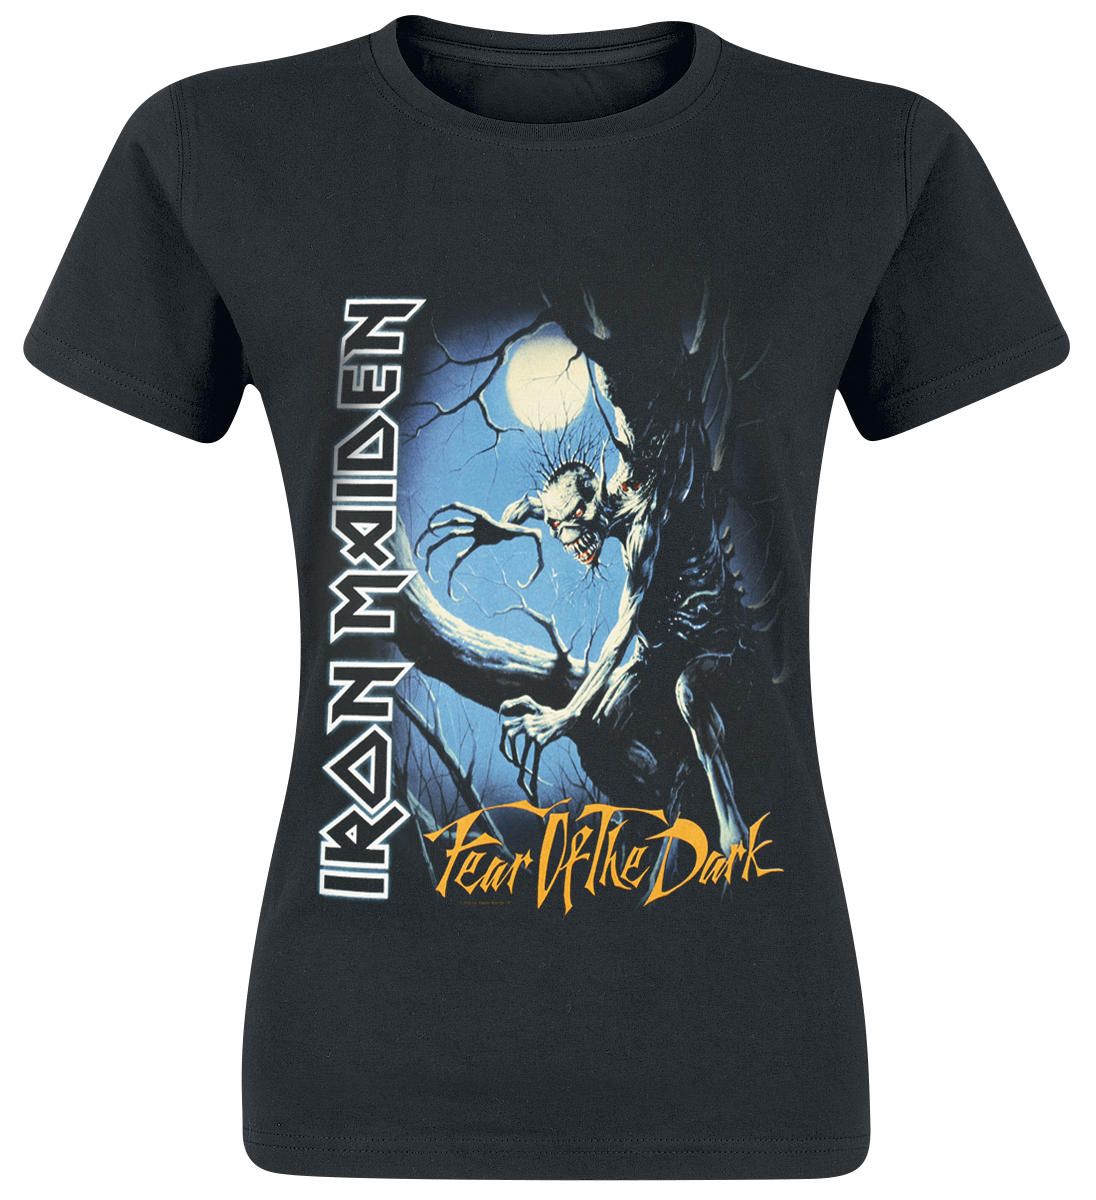 Iron Maiden Fear Of The Dark Koszulka damska czarny